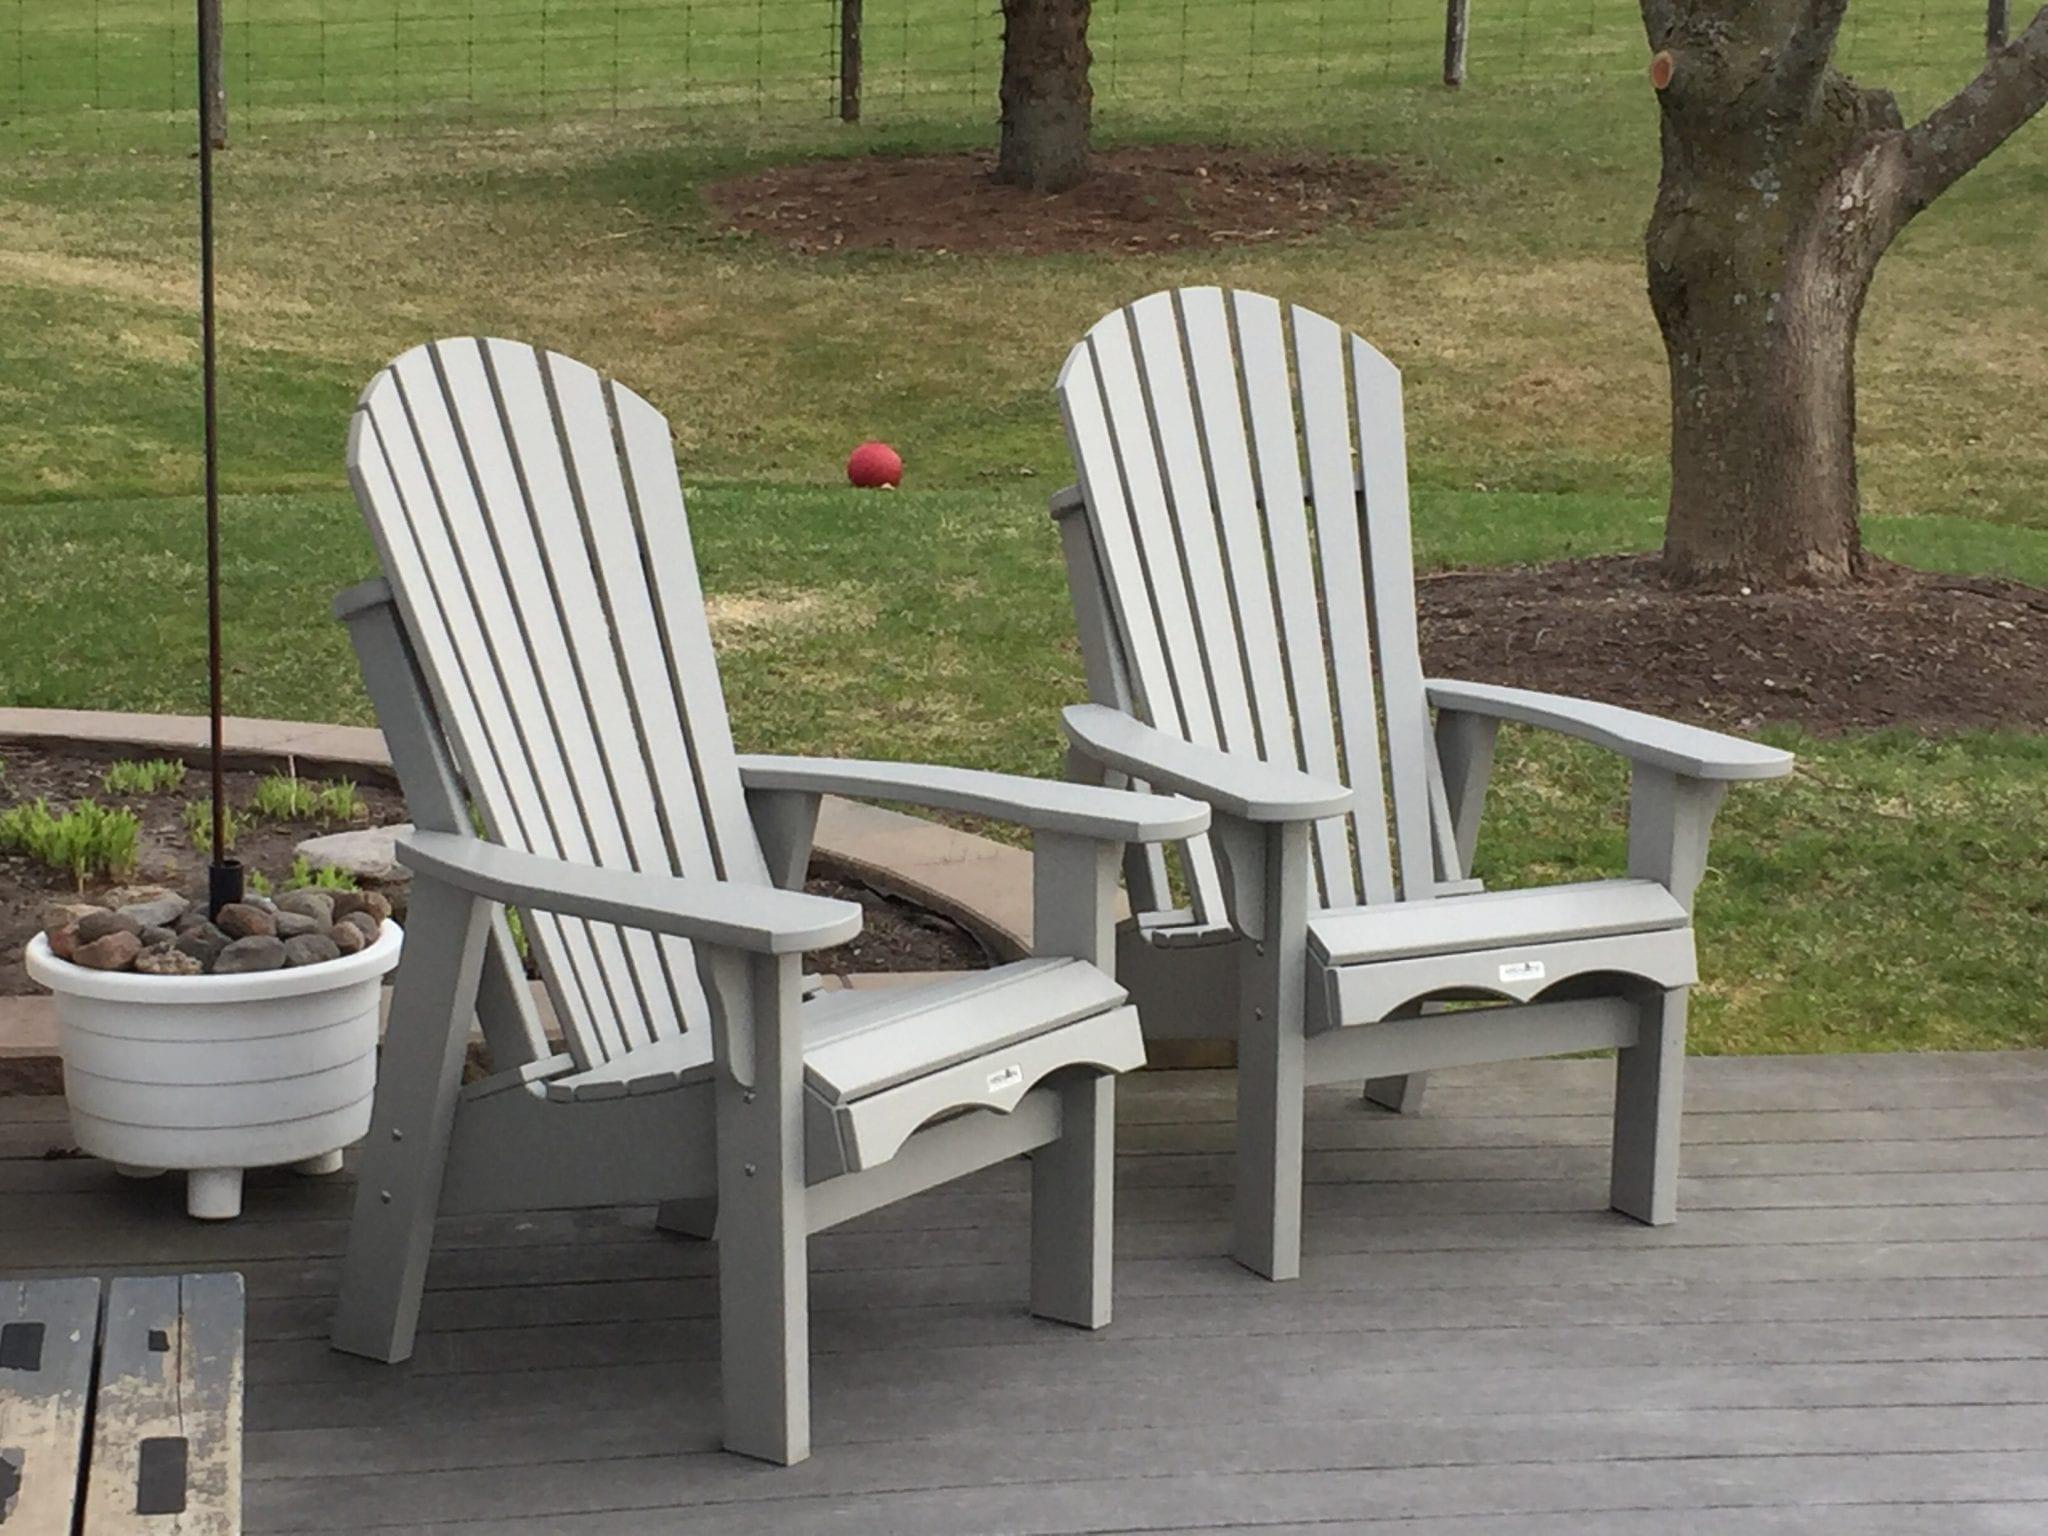 krahn small adirondack patio chair 369